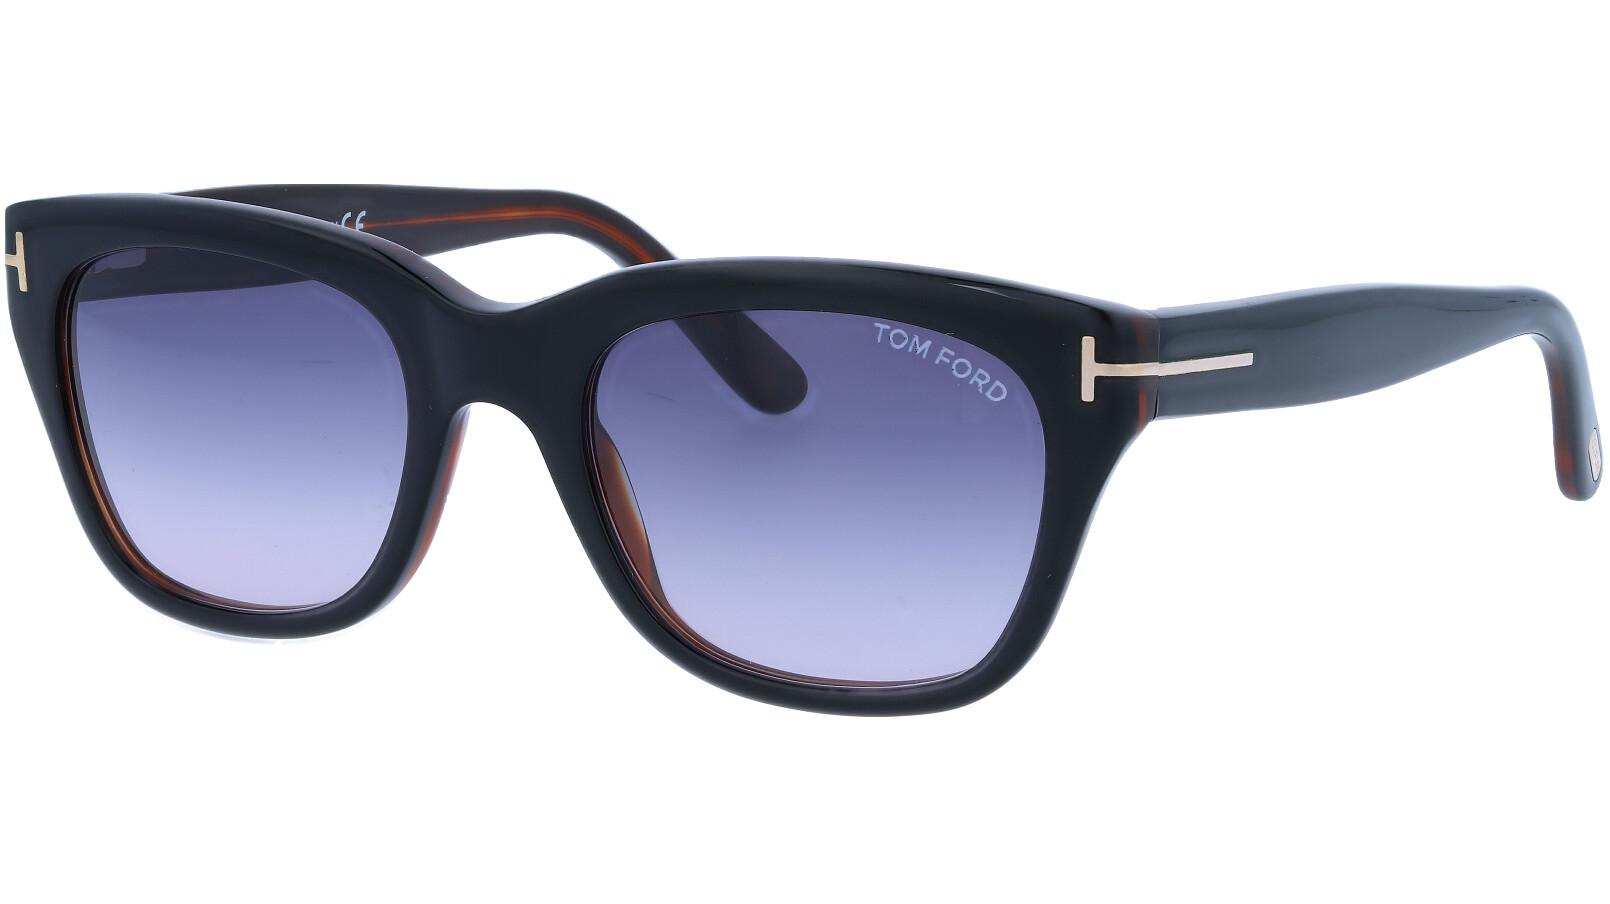 Tom Ford TF237 05B 52 Black Sunglasses